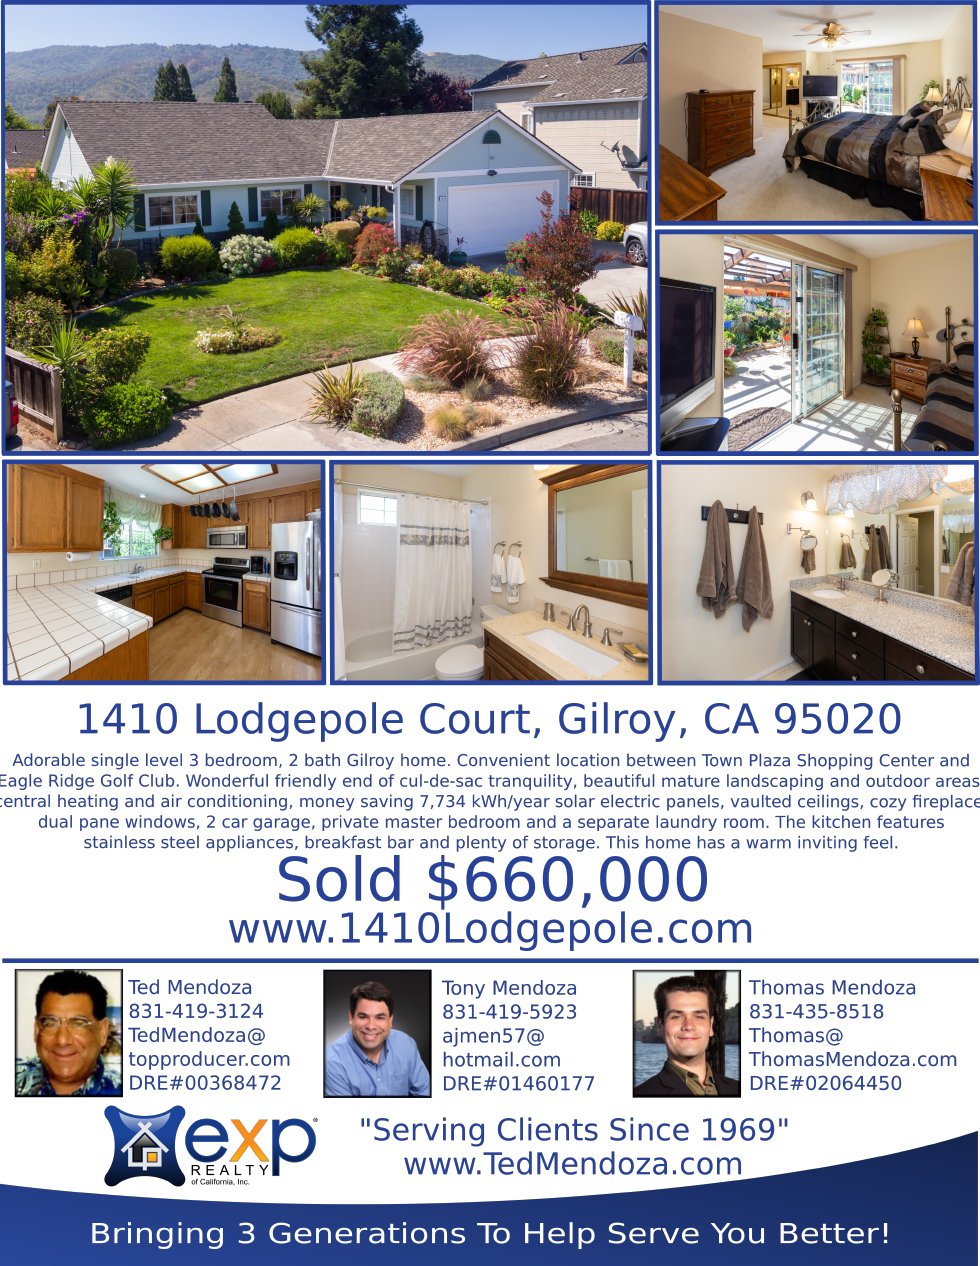 1410 Lodgepole Court, Gilroy, CA 95020